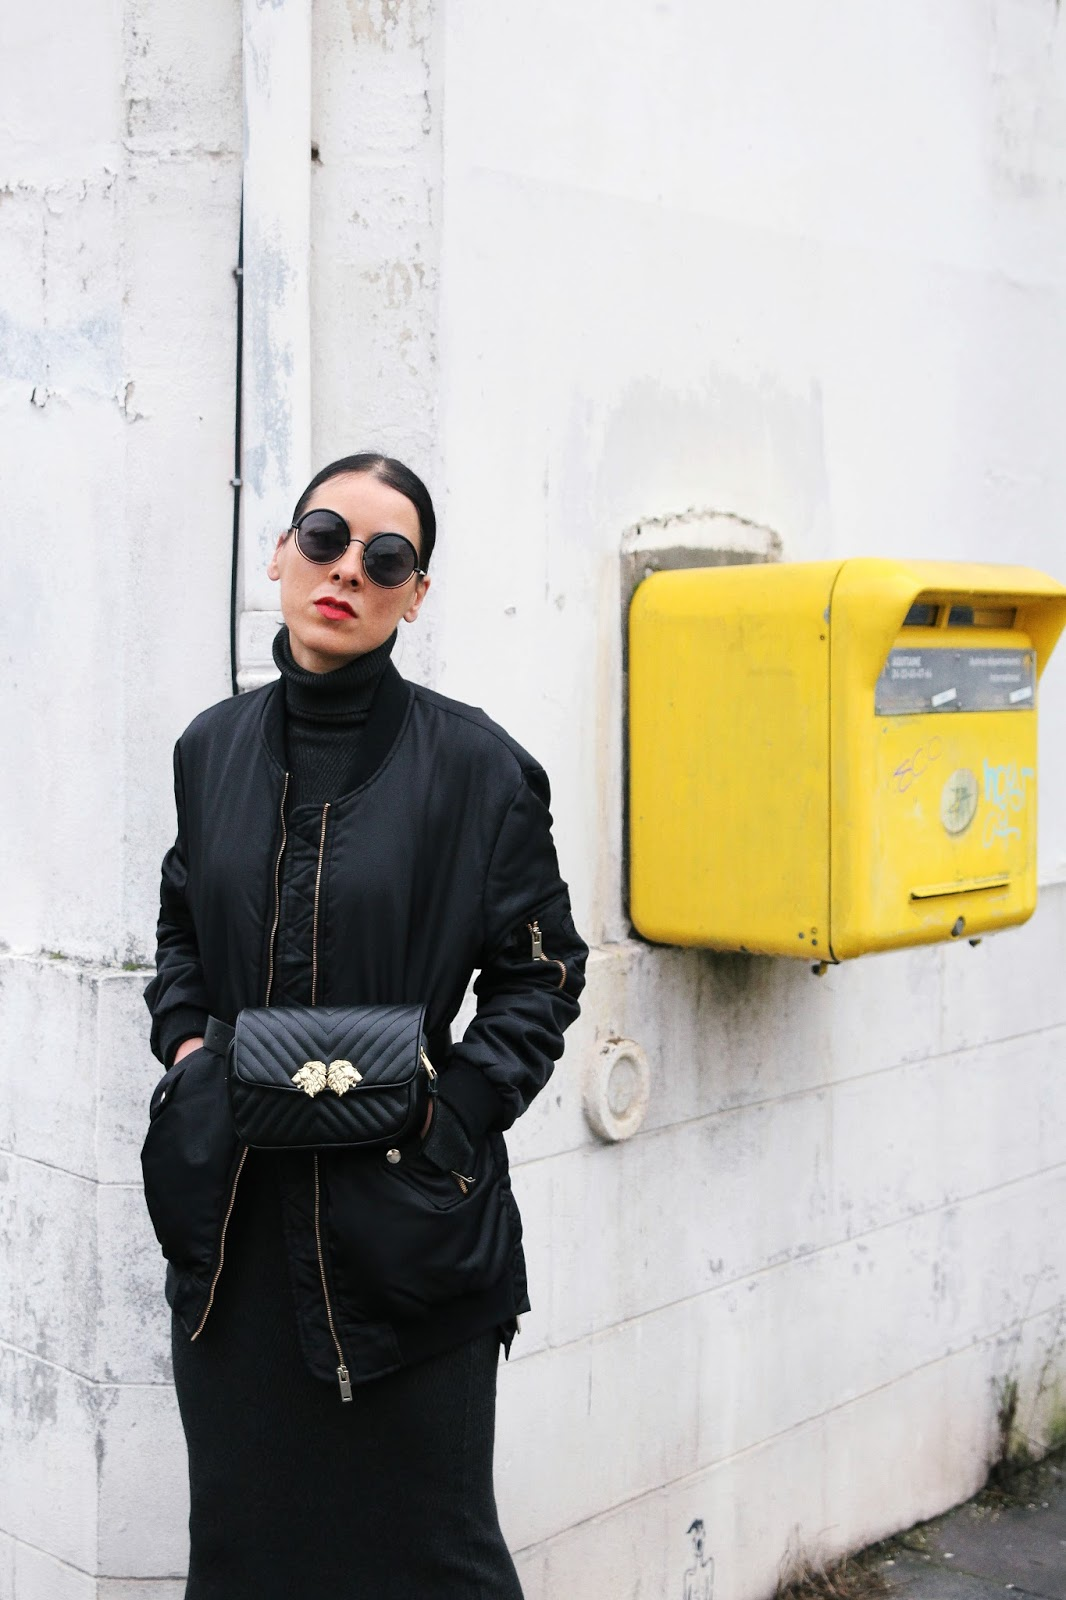 tendance bottines blanche et sac banane hiver 2018